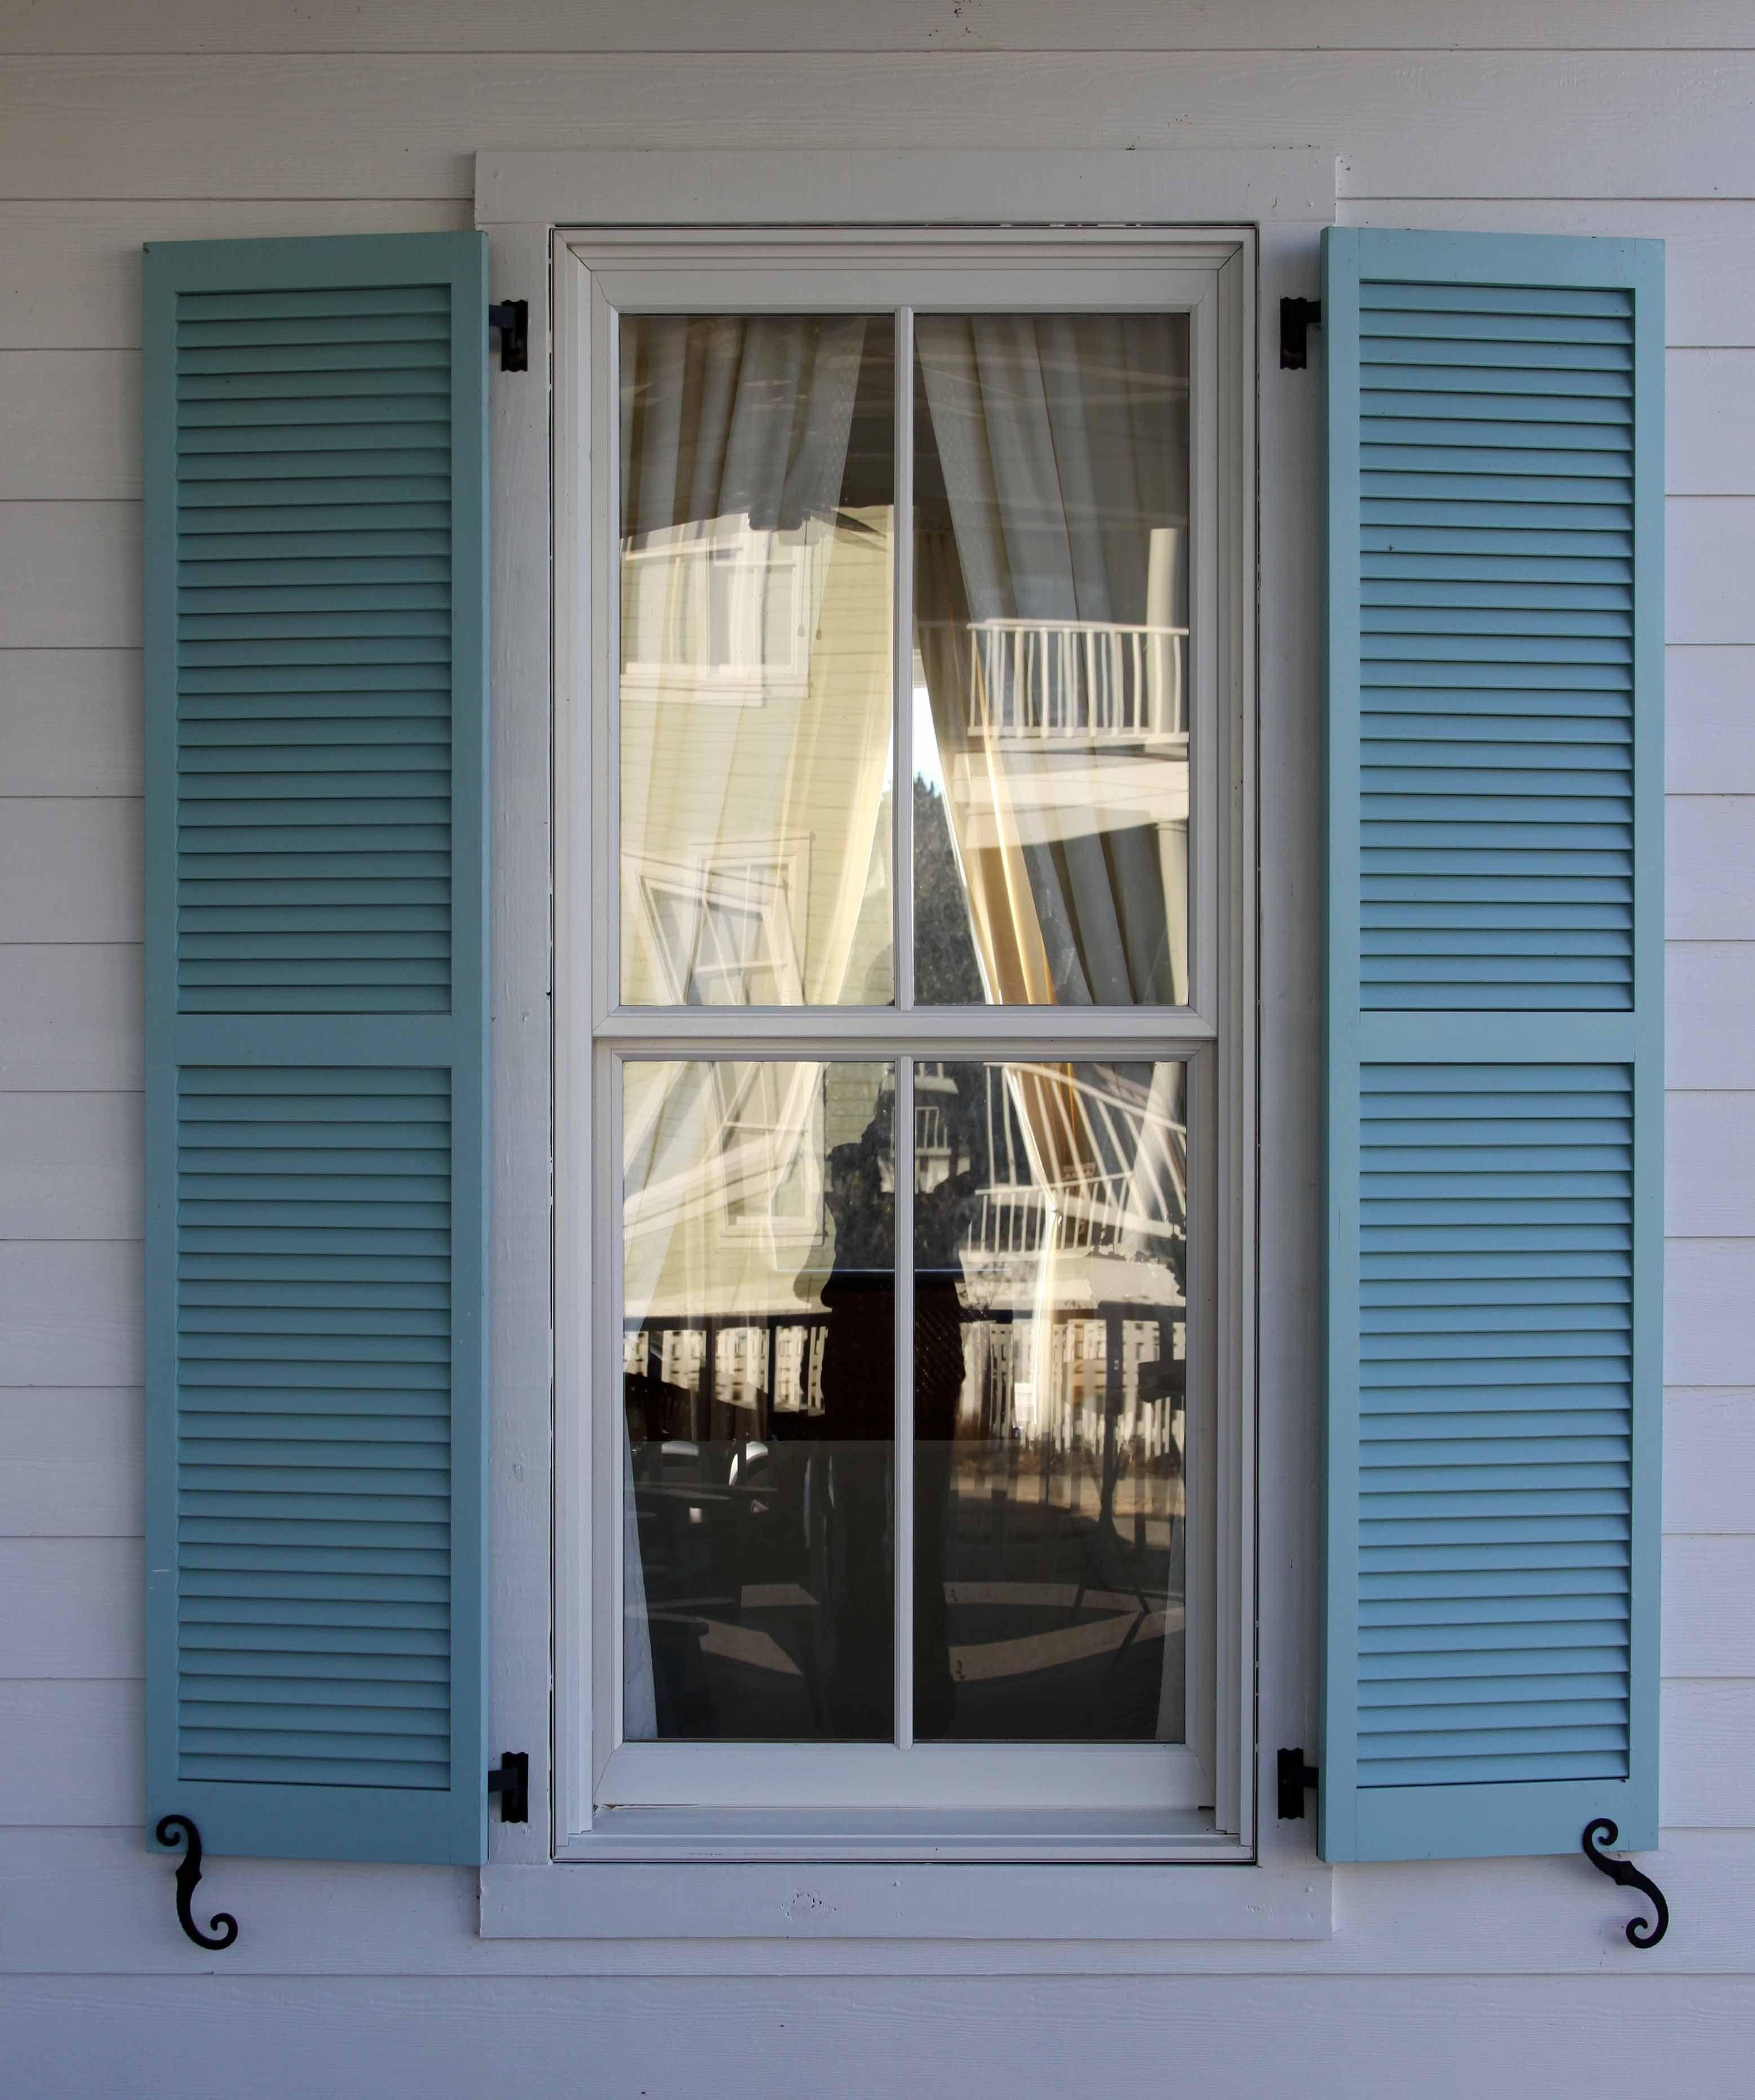 interior hardware best gratograt us australia railings shutters sydney window shutter r bifold of photos hinges lovely system louvres